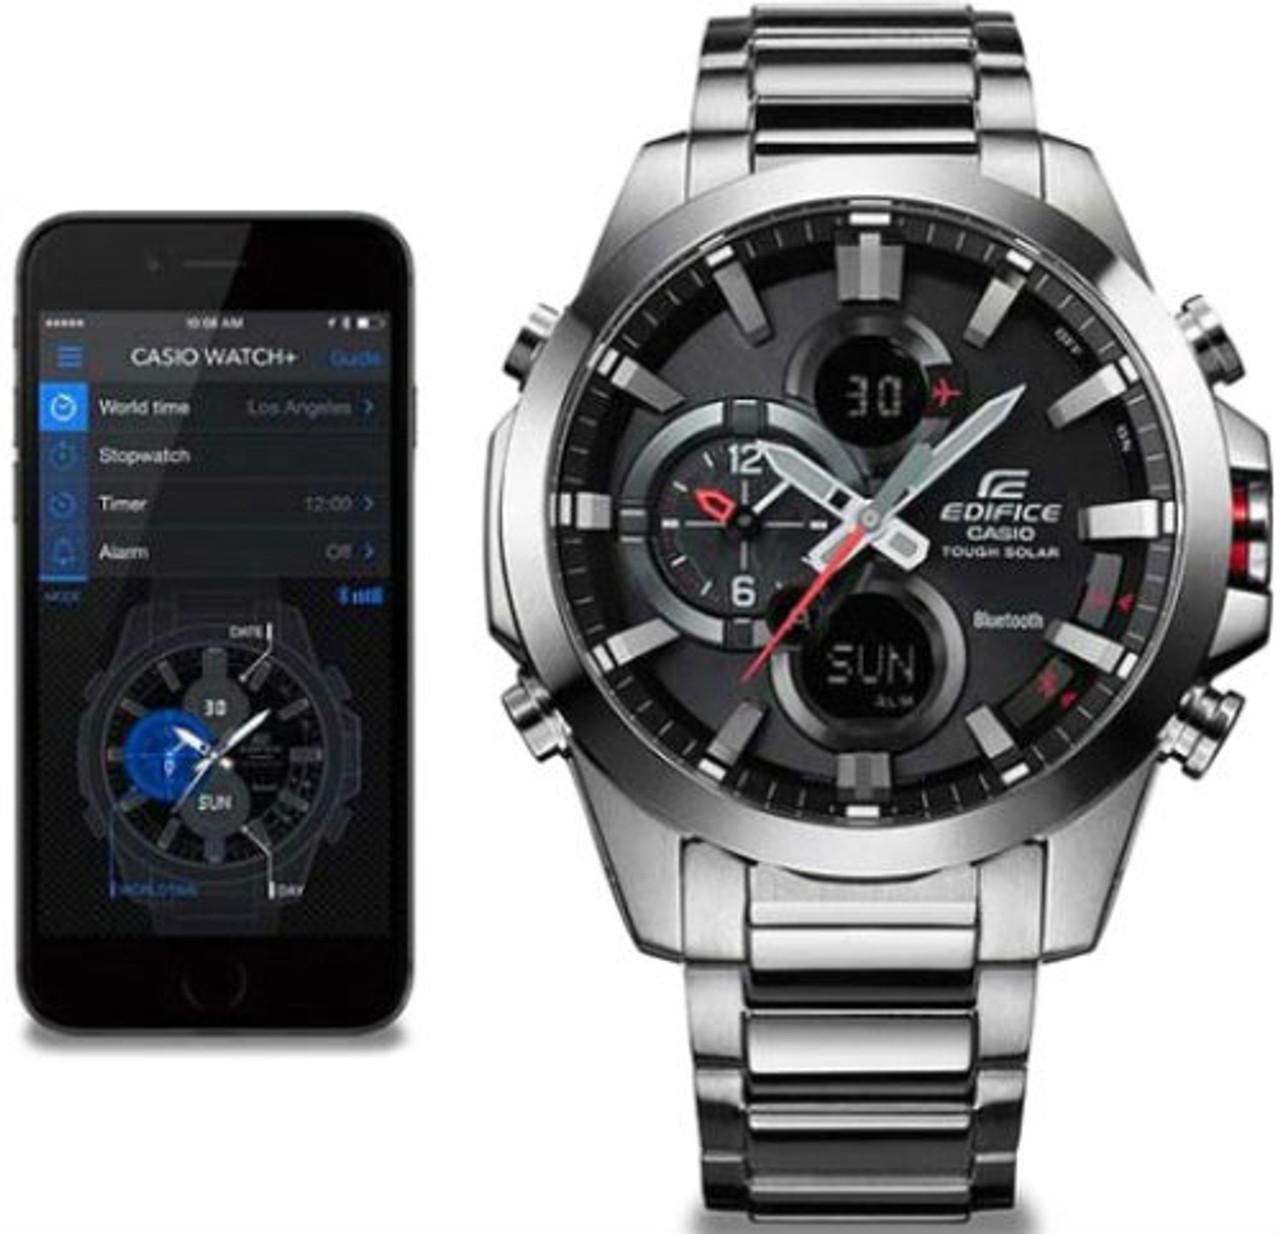 500d Ecb Solar Casio Edifice Analogue Tough 1aer Bluetooth Watch SpMVUzGLq